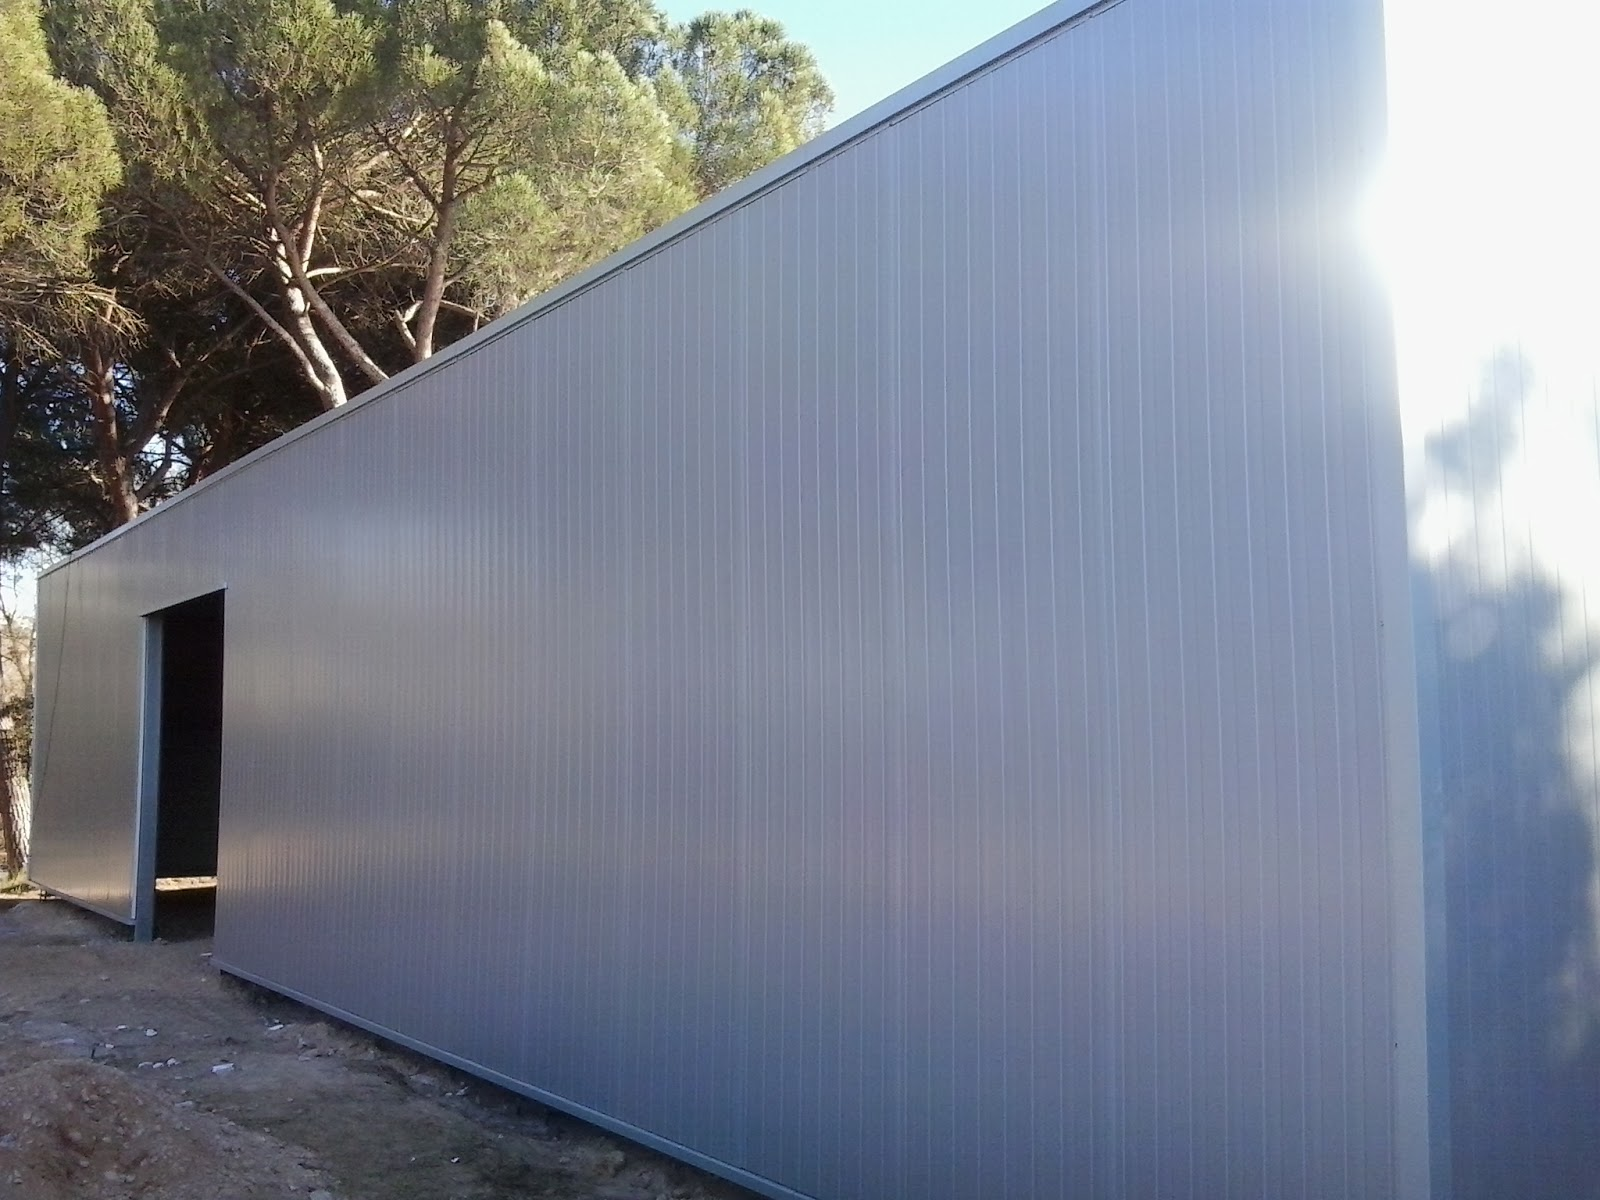 Naves prefabricadas metalicas de panel s ndwich o de chapa for Casetas de chapa galvanizada precios